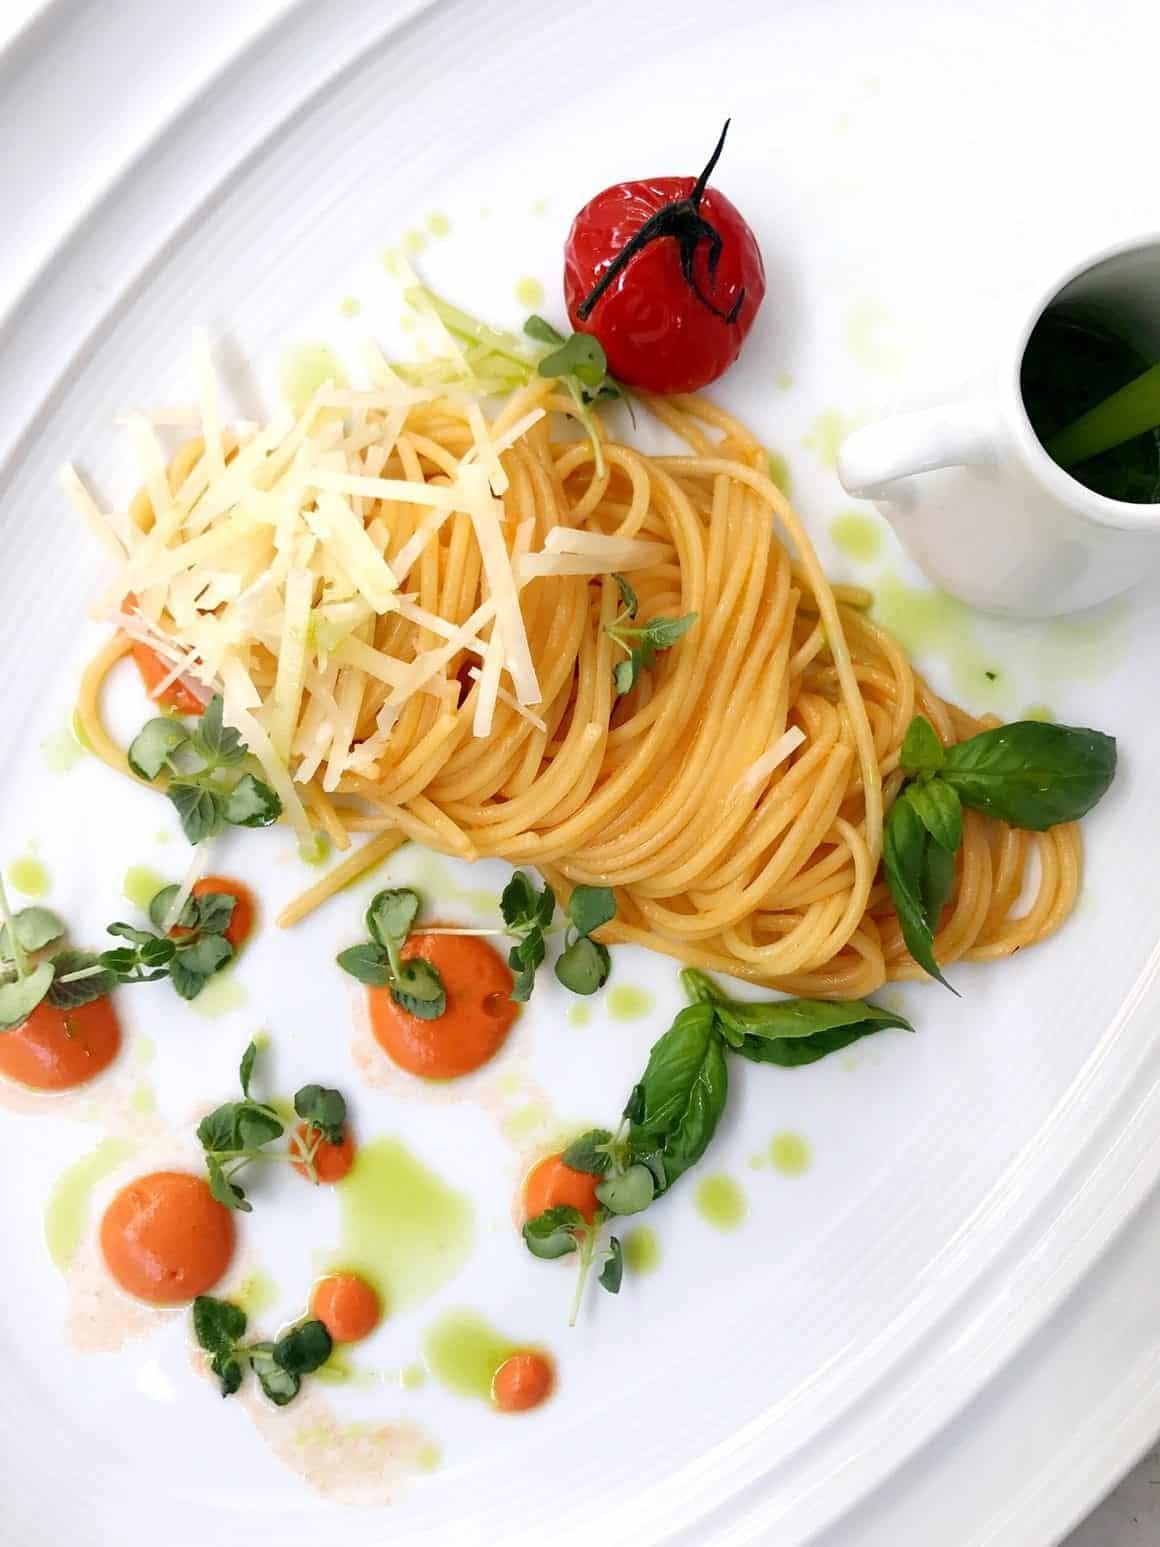 Pasta World Championship in Milan & Parma